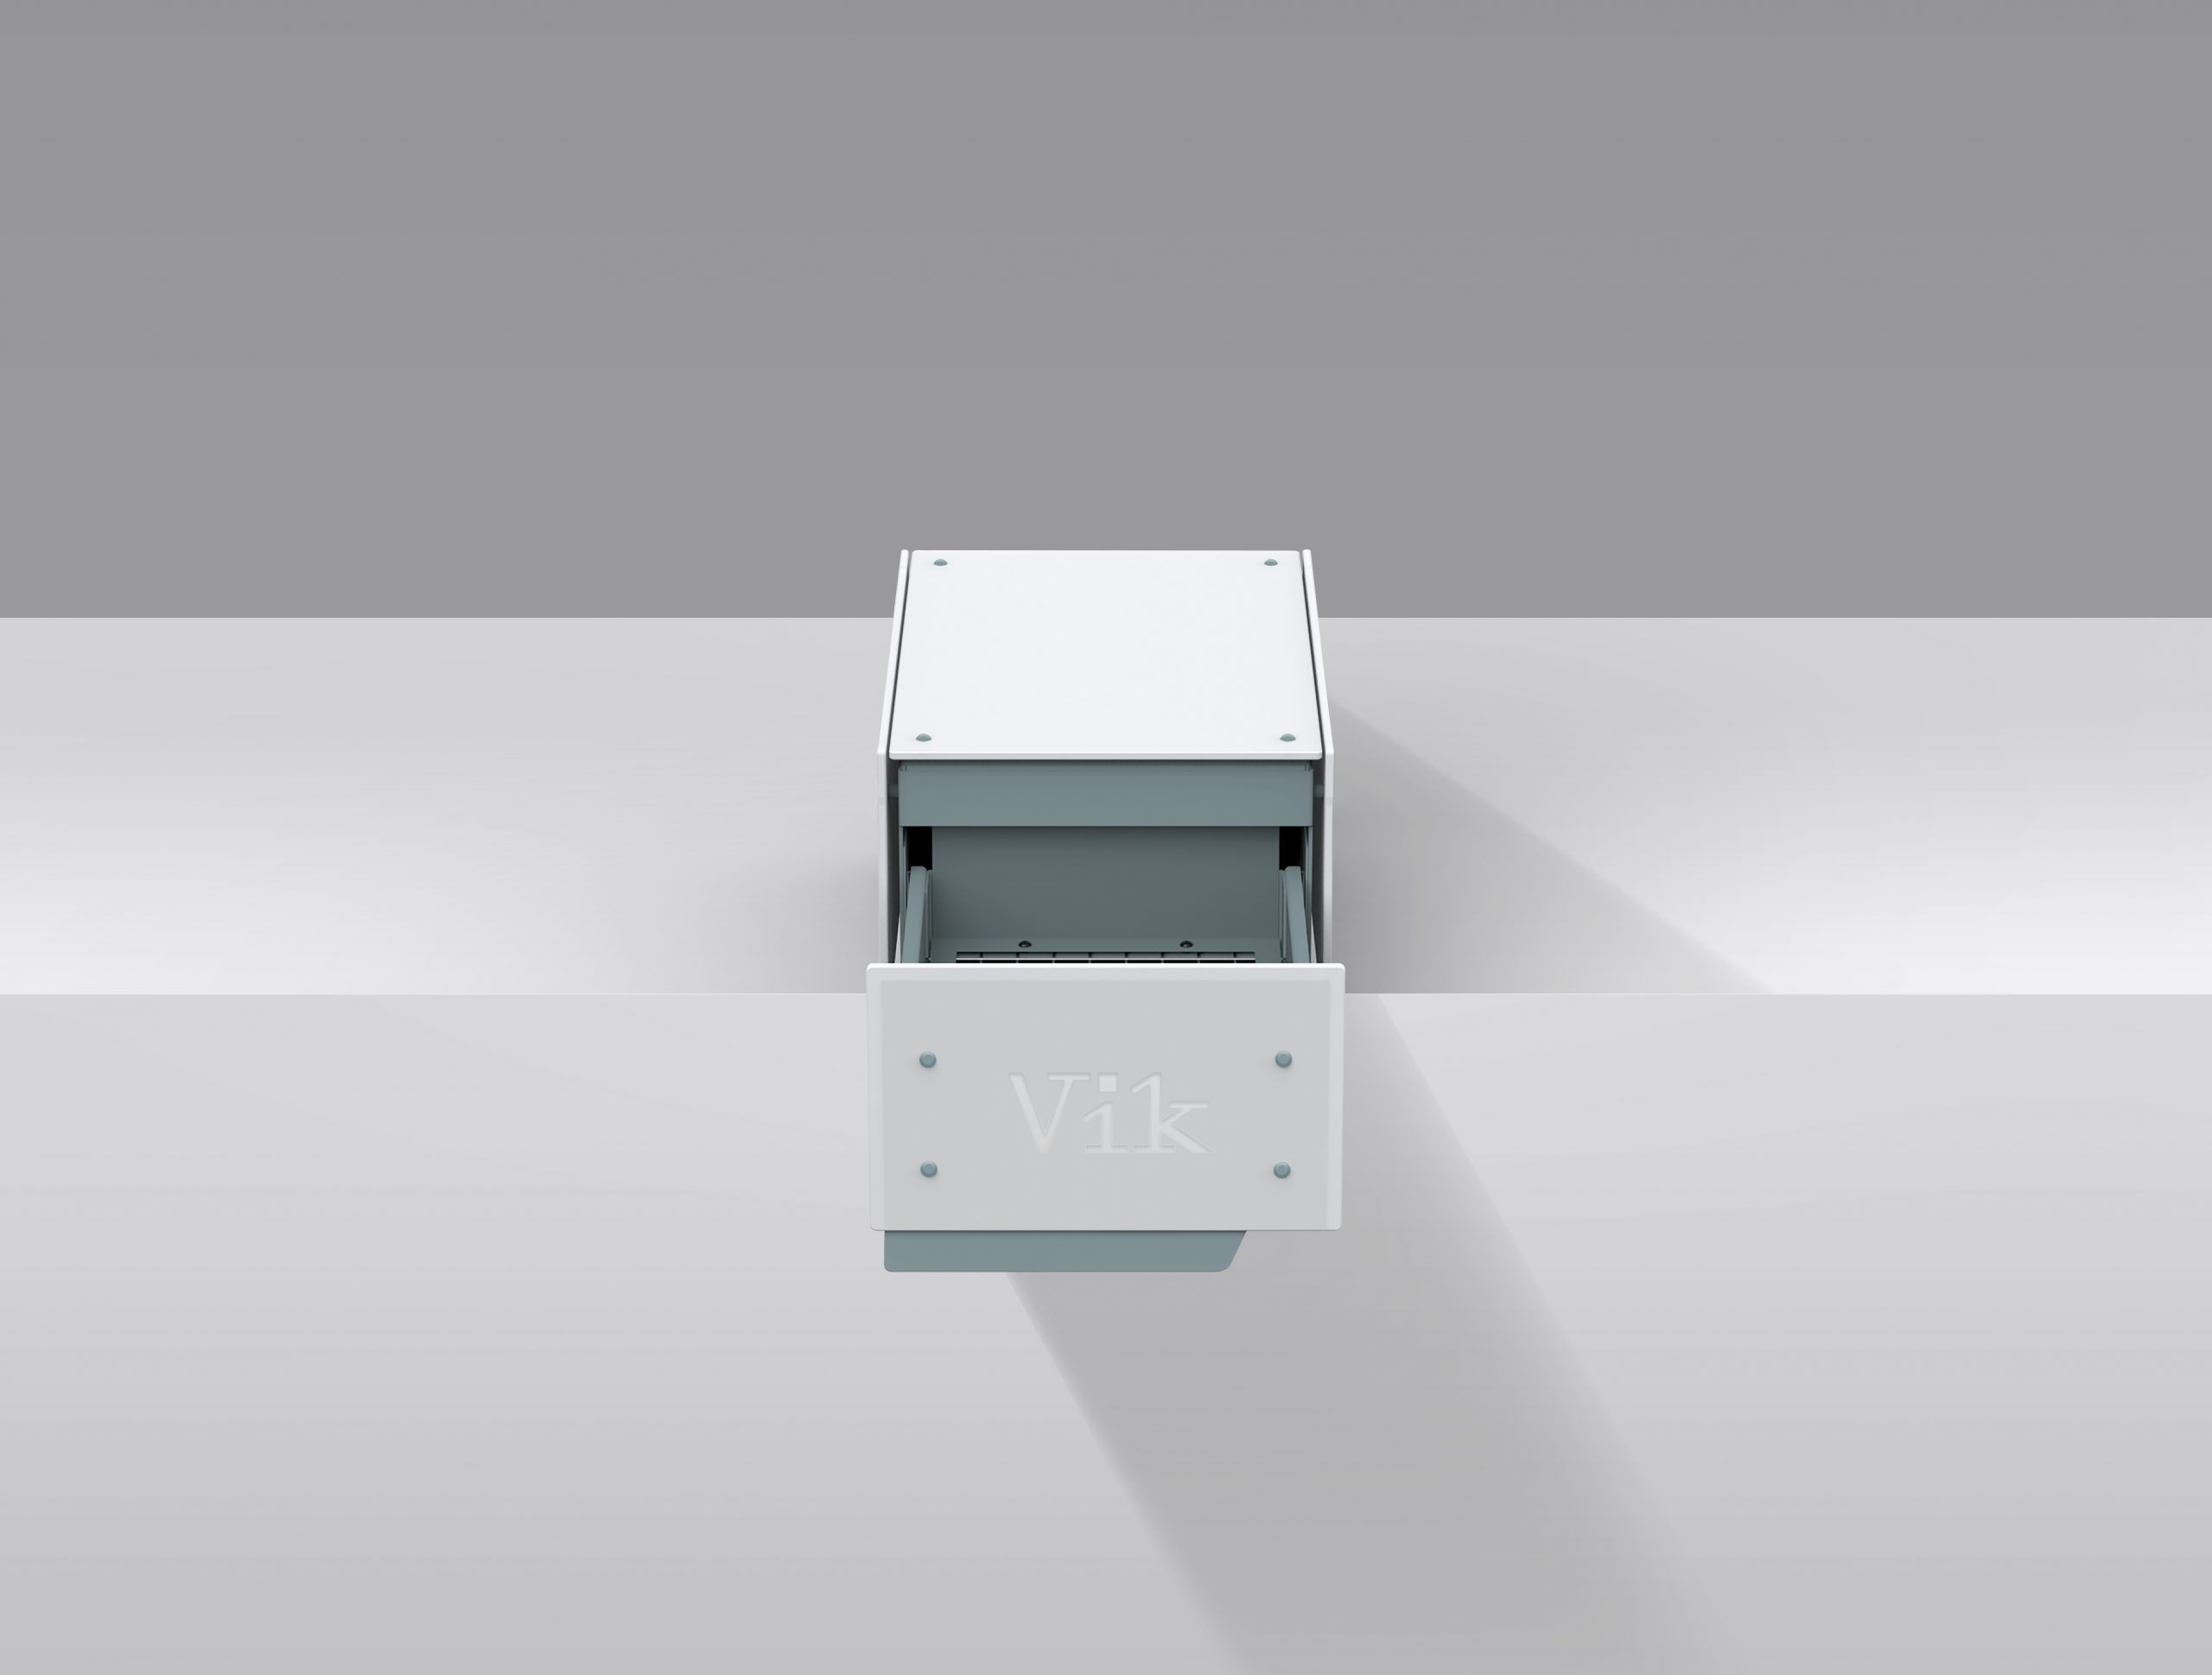 Vik Model k uv-c desinfectiekast open